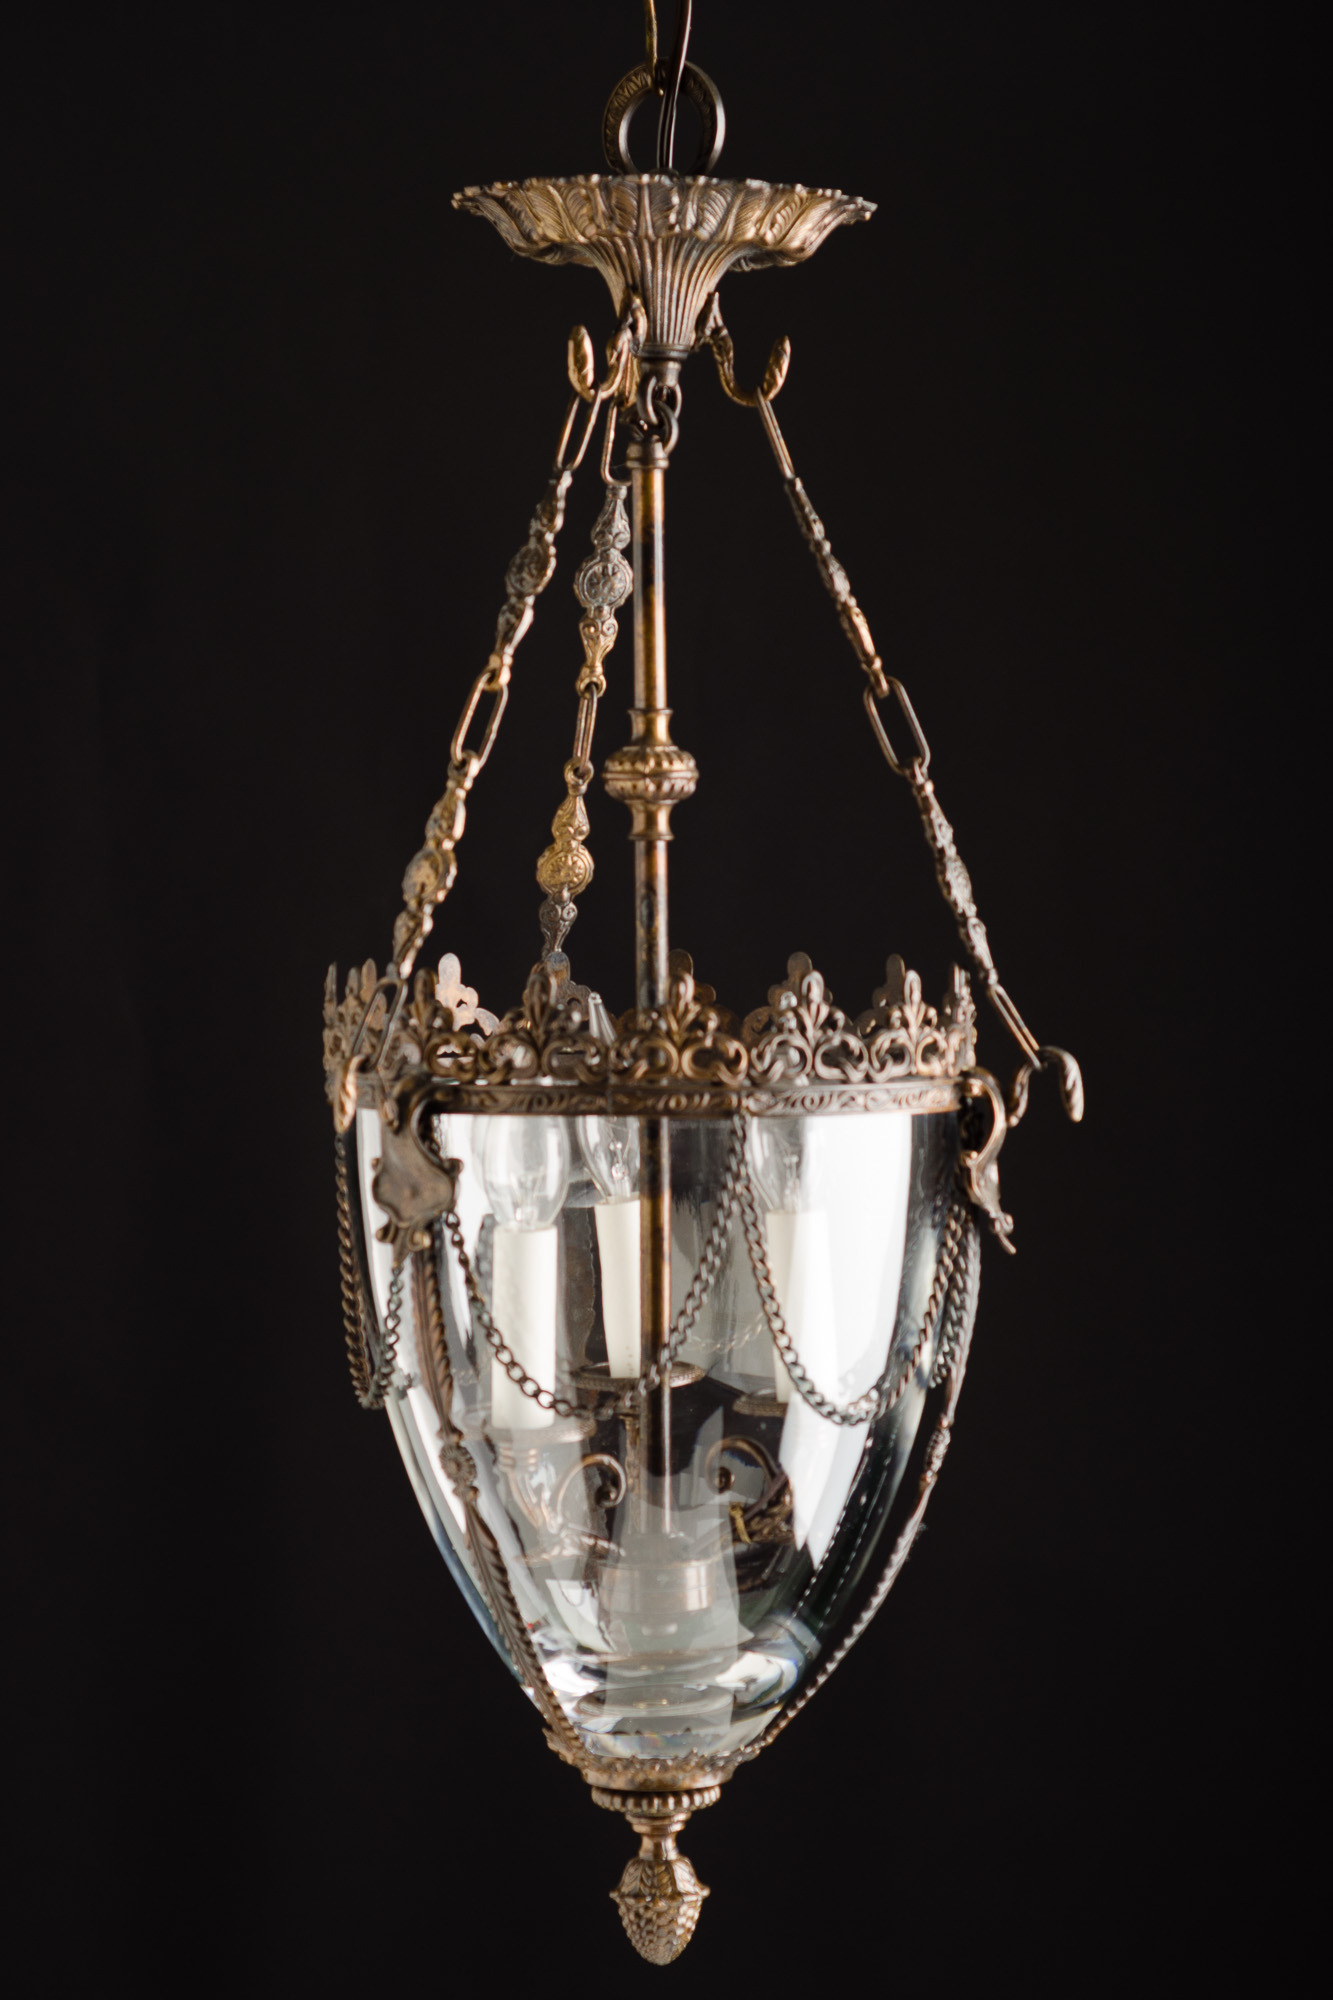 Jar Pendant Light